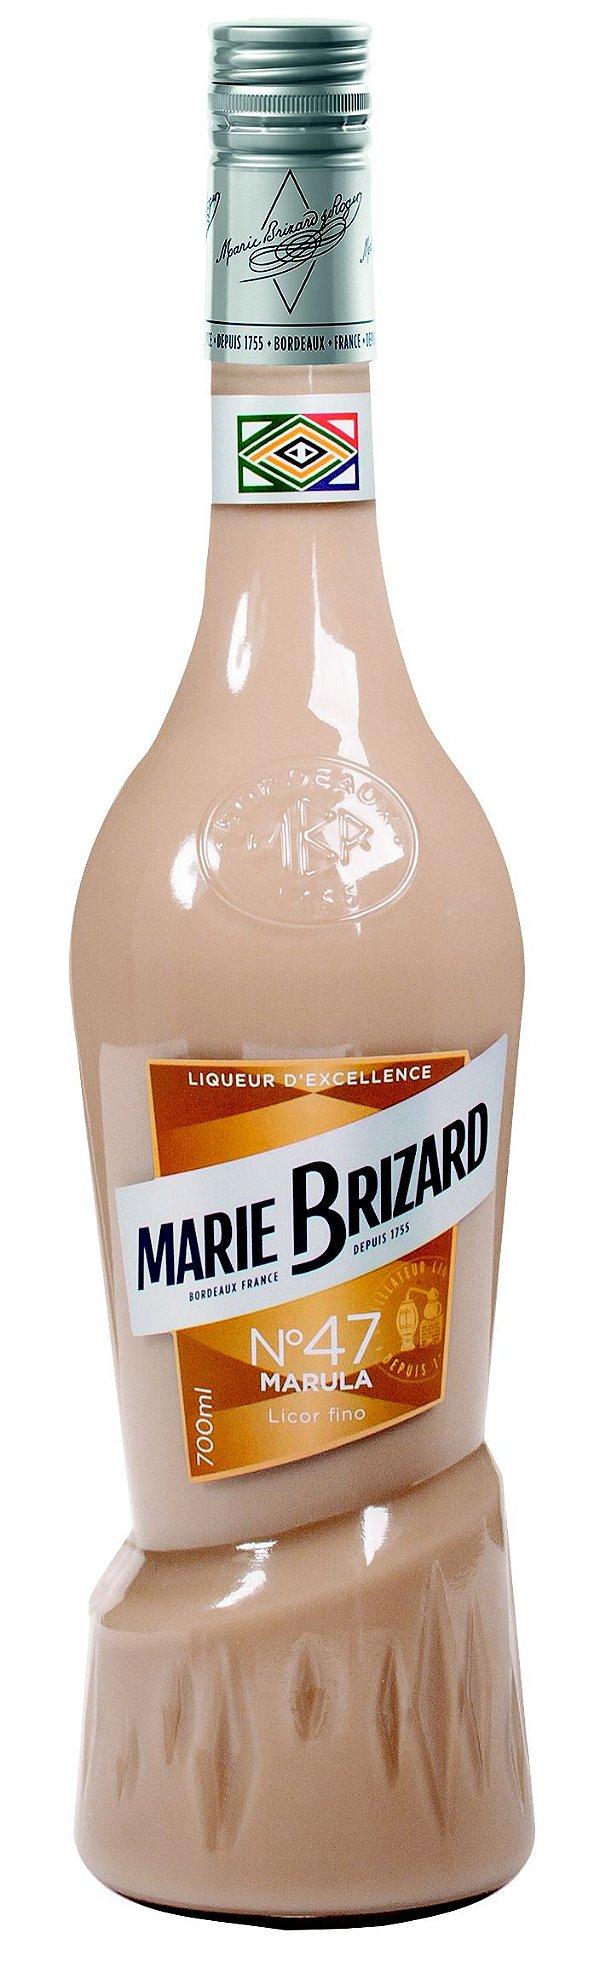 MARIE BRIZARD MARULA 700ML